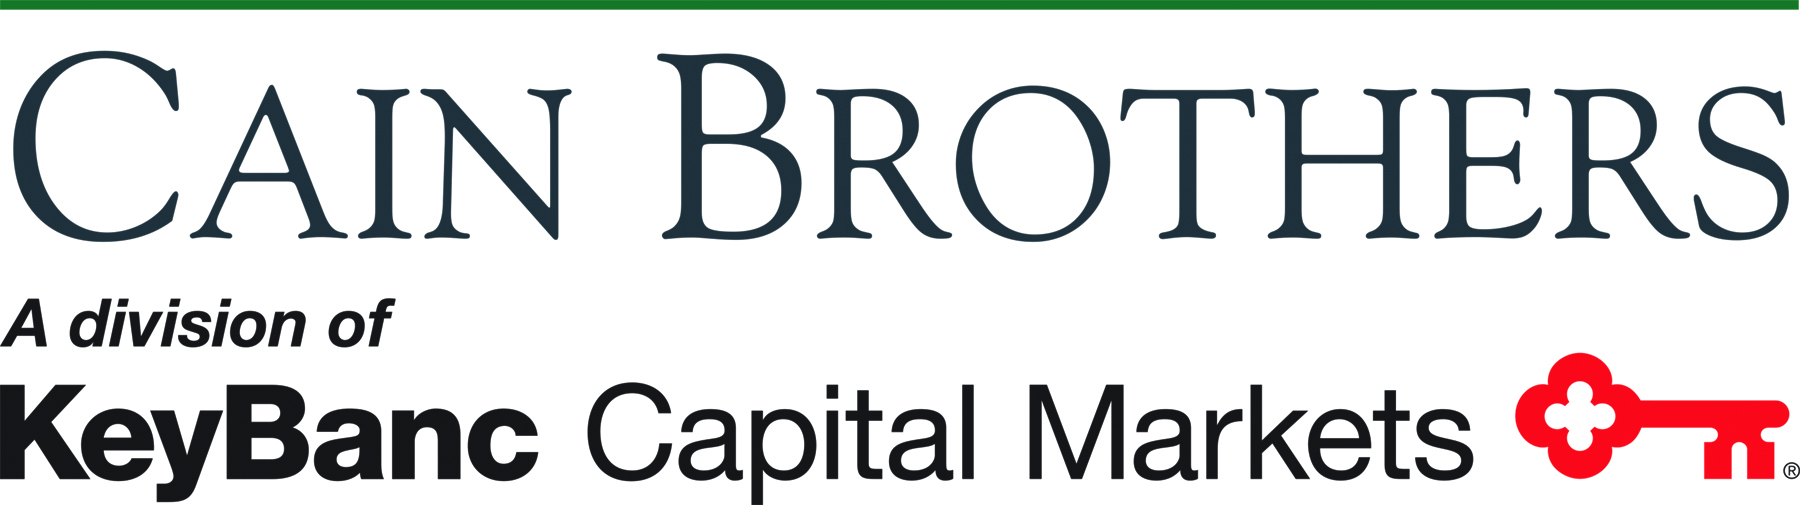 cain brothers logo